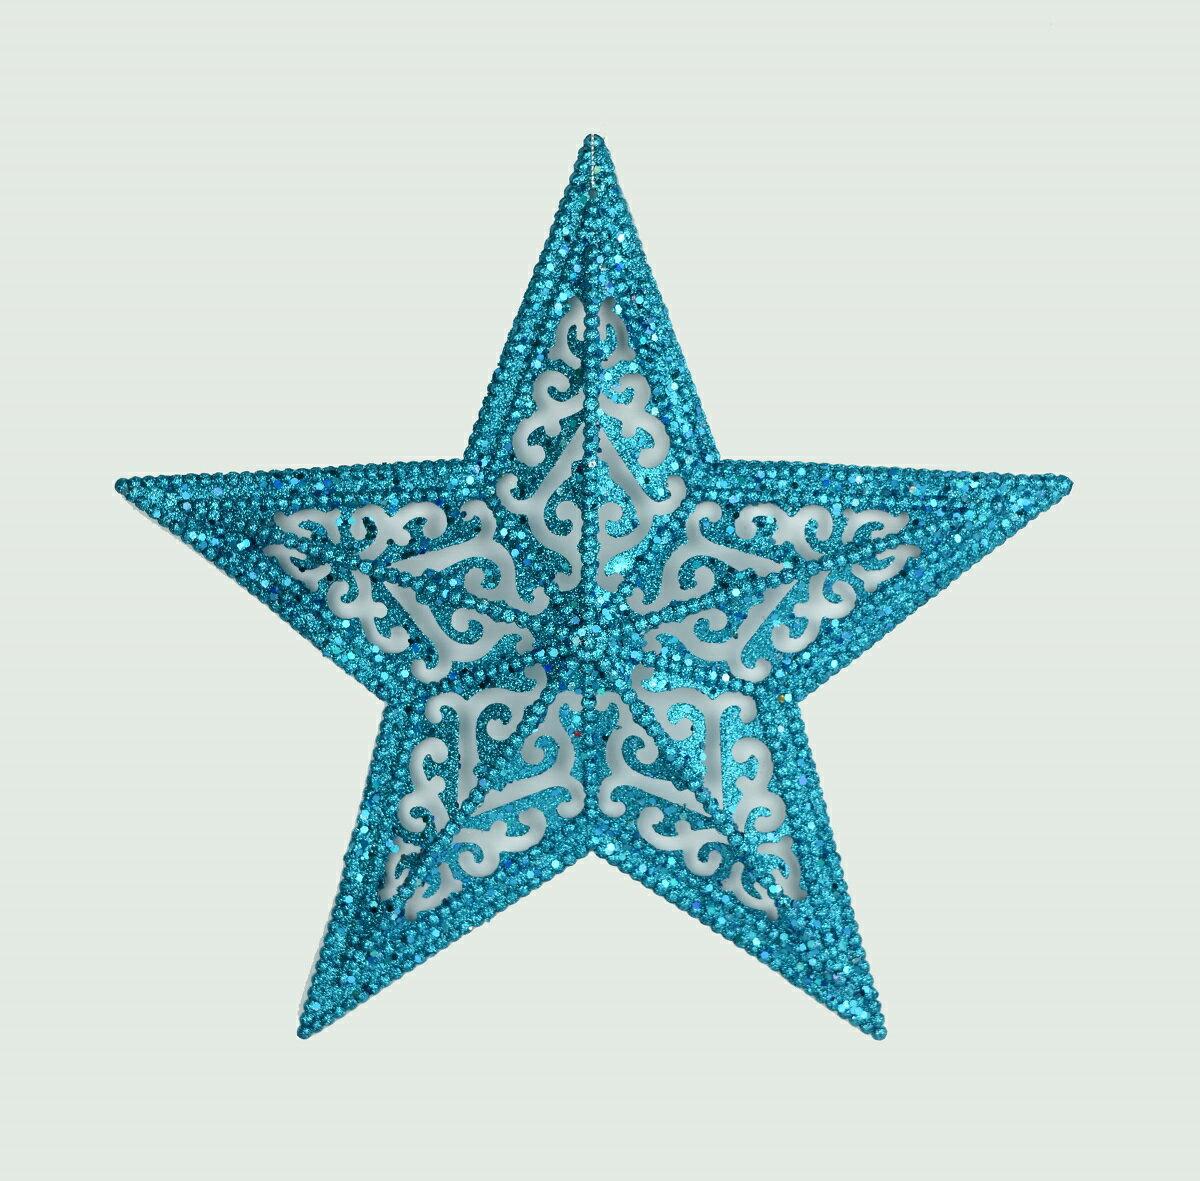 X射線【X299704】30CM金粉五角星吊飾(隨機出貨),聖誕節/聖誕樹/聖誕佈置/聖誕掛飾/裝飾/掛飾/會場佈置/DIY/材料包